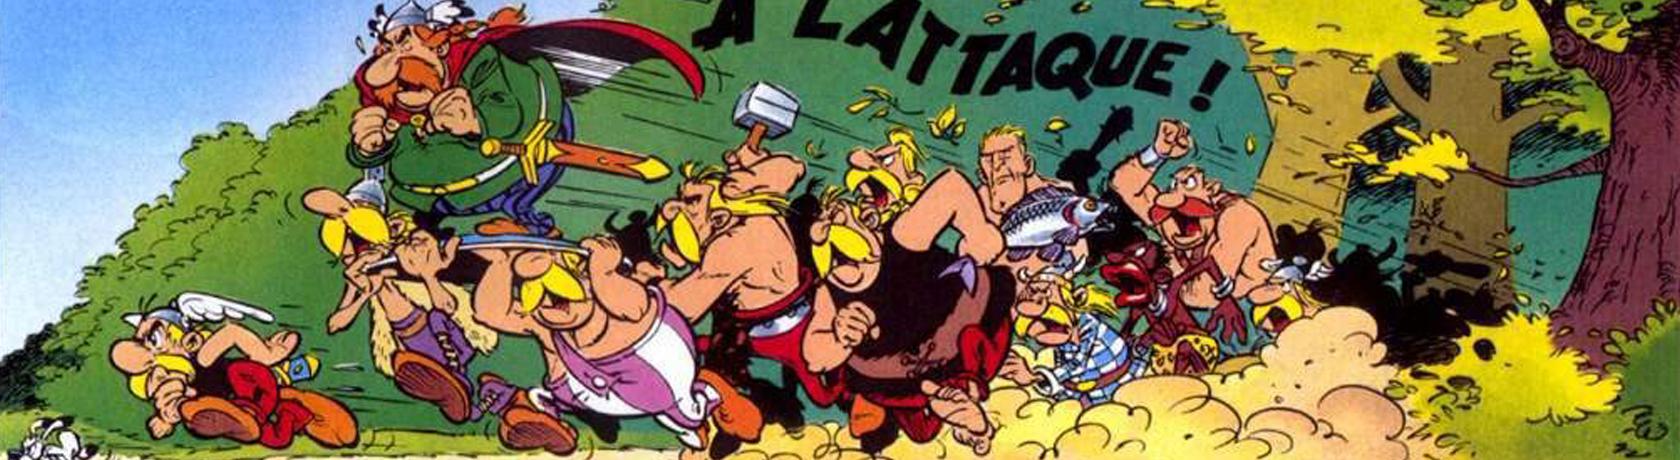 asterix.png#asset:248